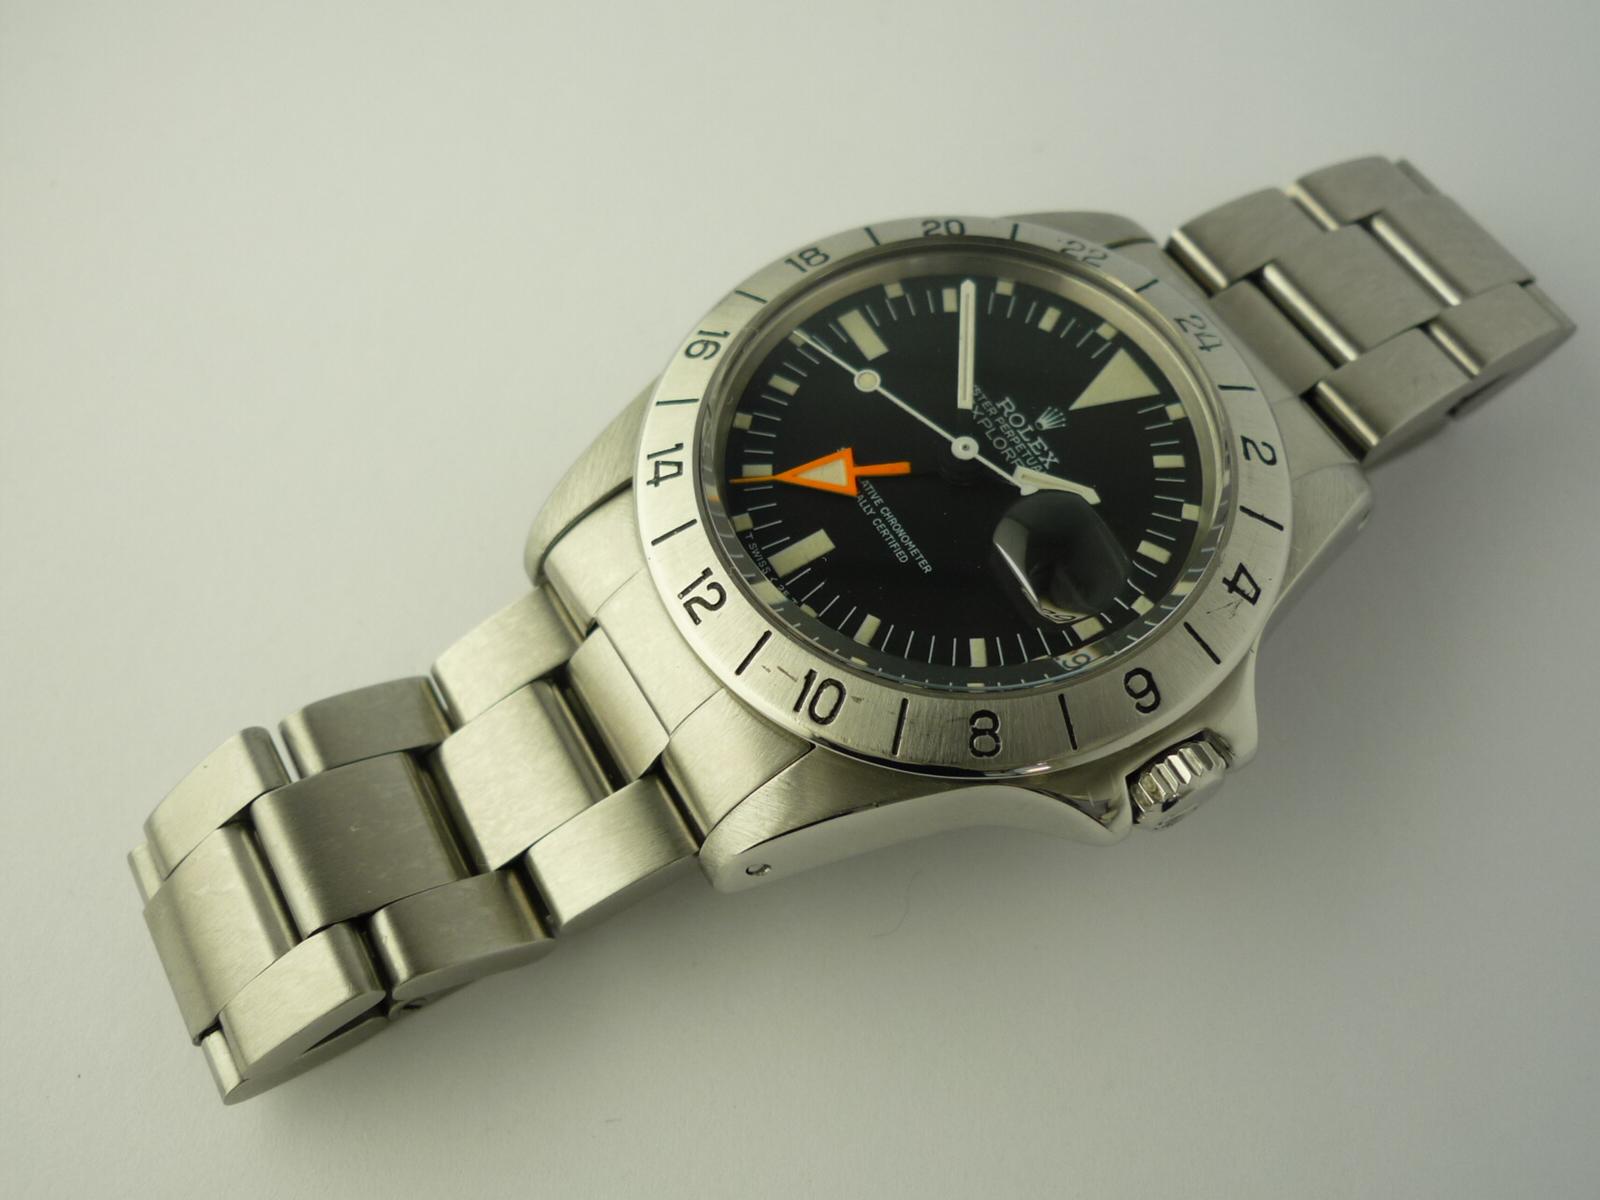 Rolex Oyster Perpetual Explorer II ref 1655 B & P (1972)